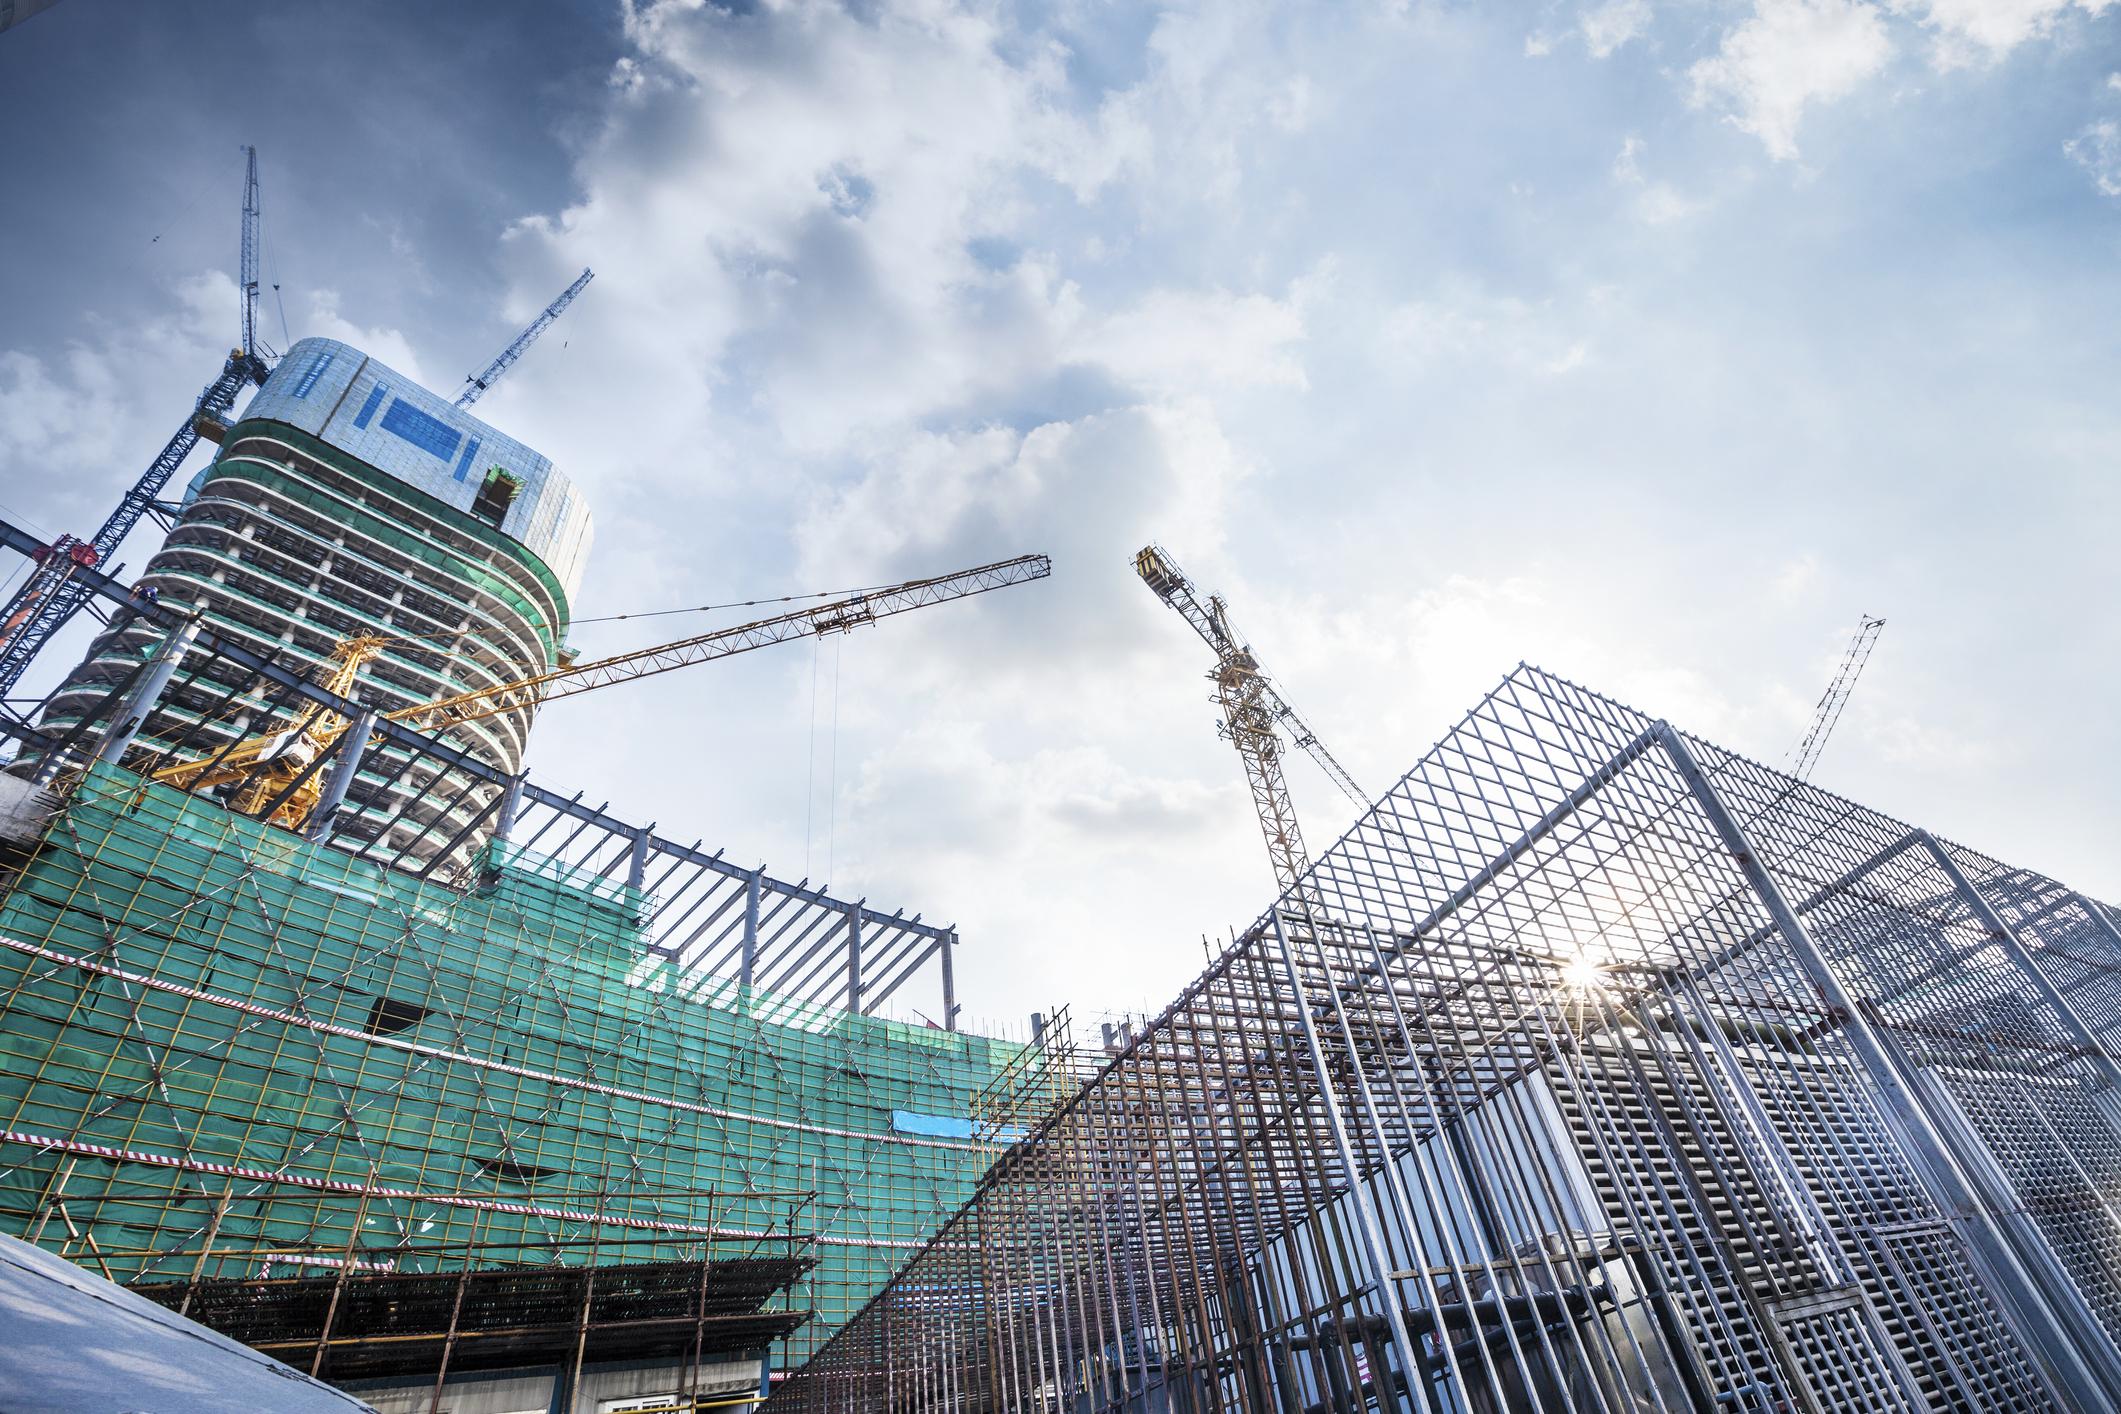 property payment schedule, progressive payment new condo, payment schedule new property malaysia